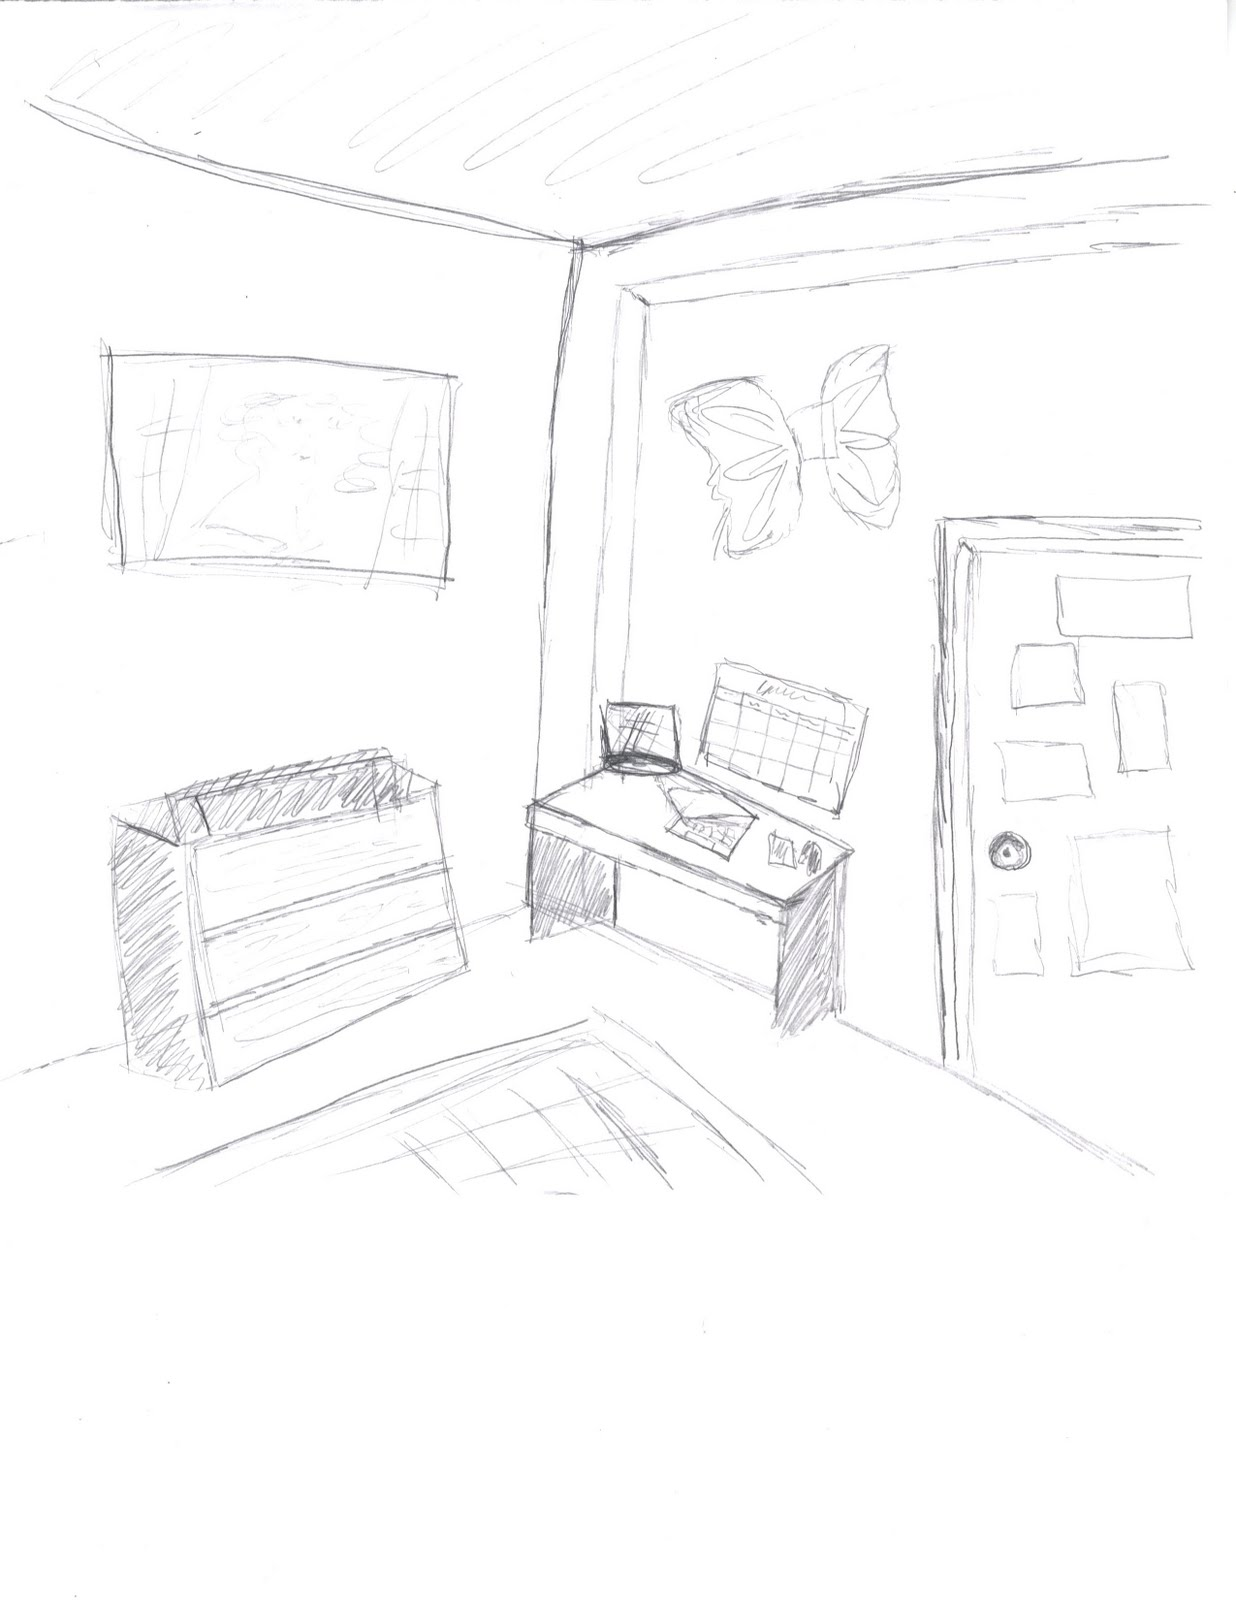 Living Room Sketch: Paige's Design Portfolio: Corner Room